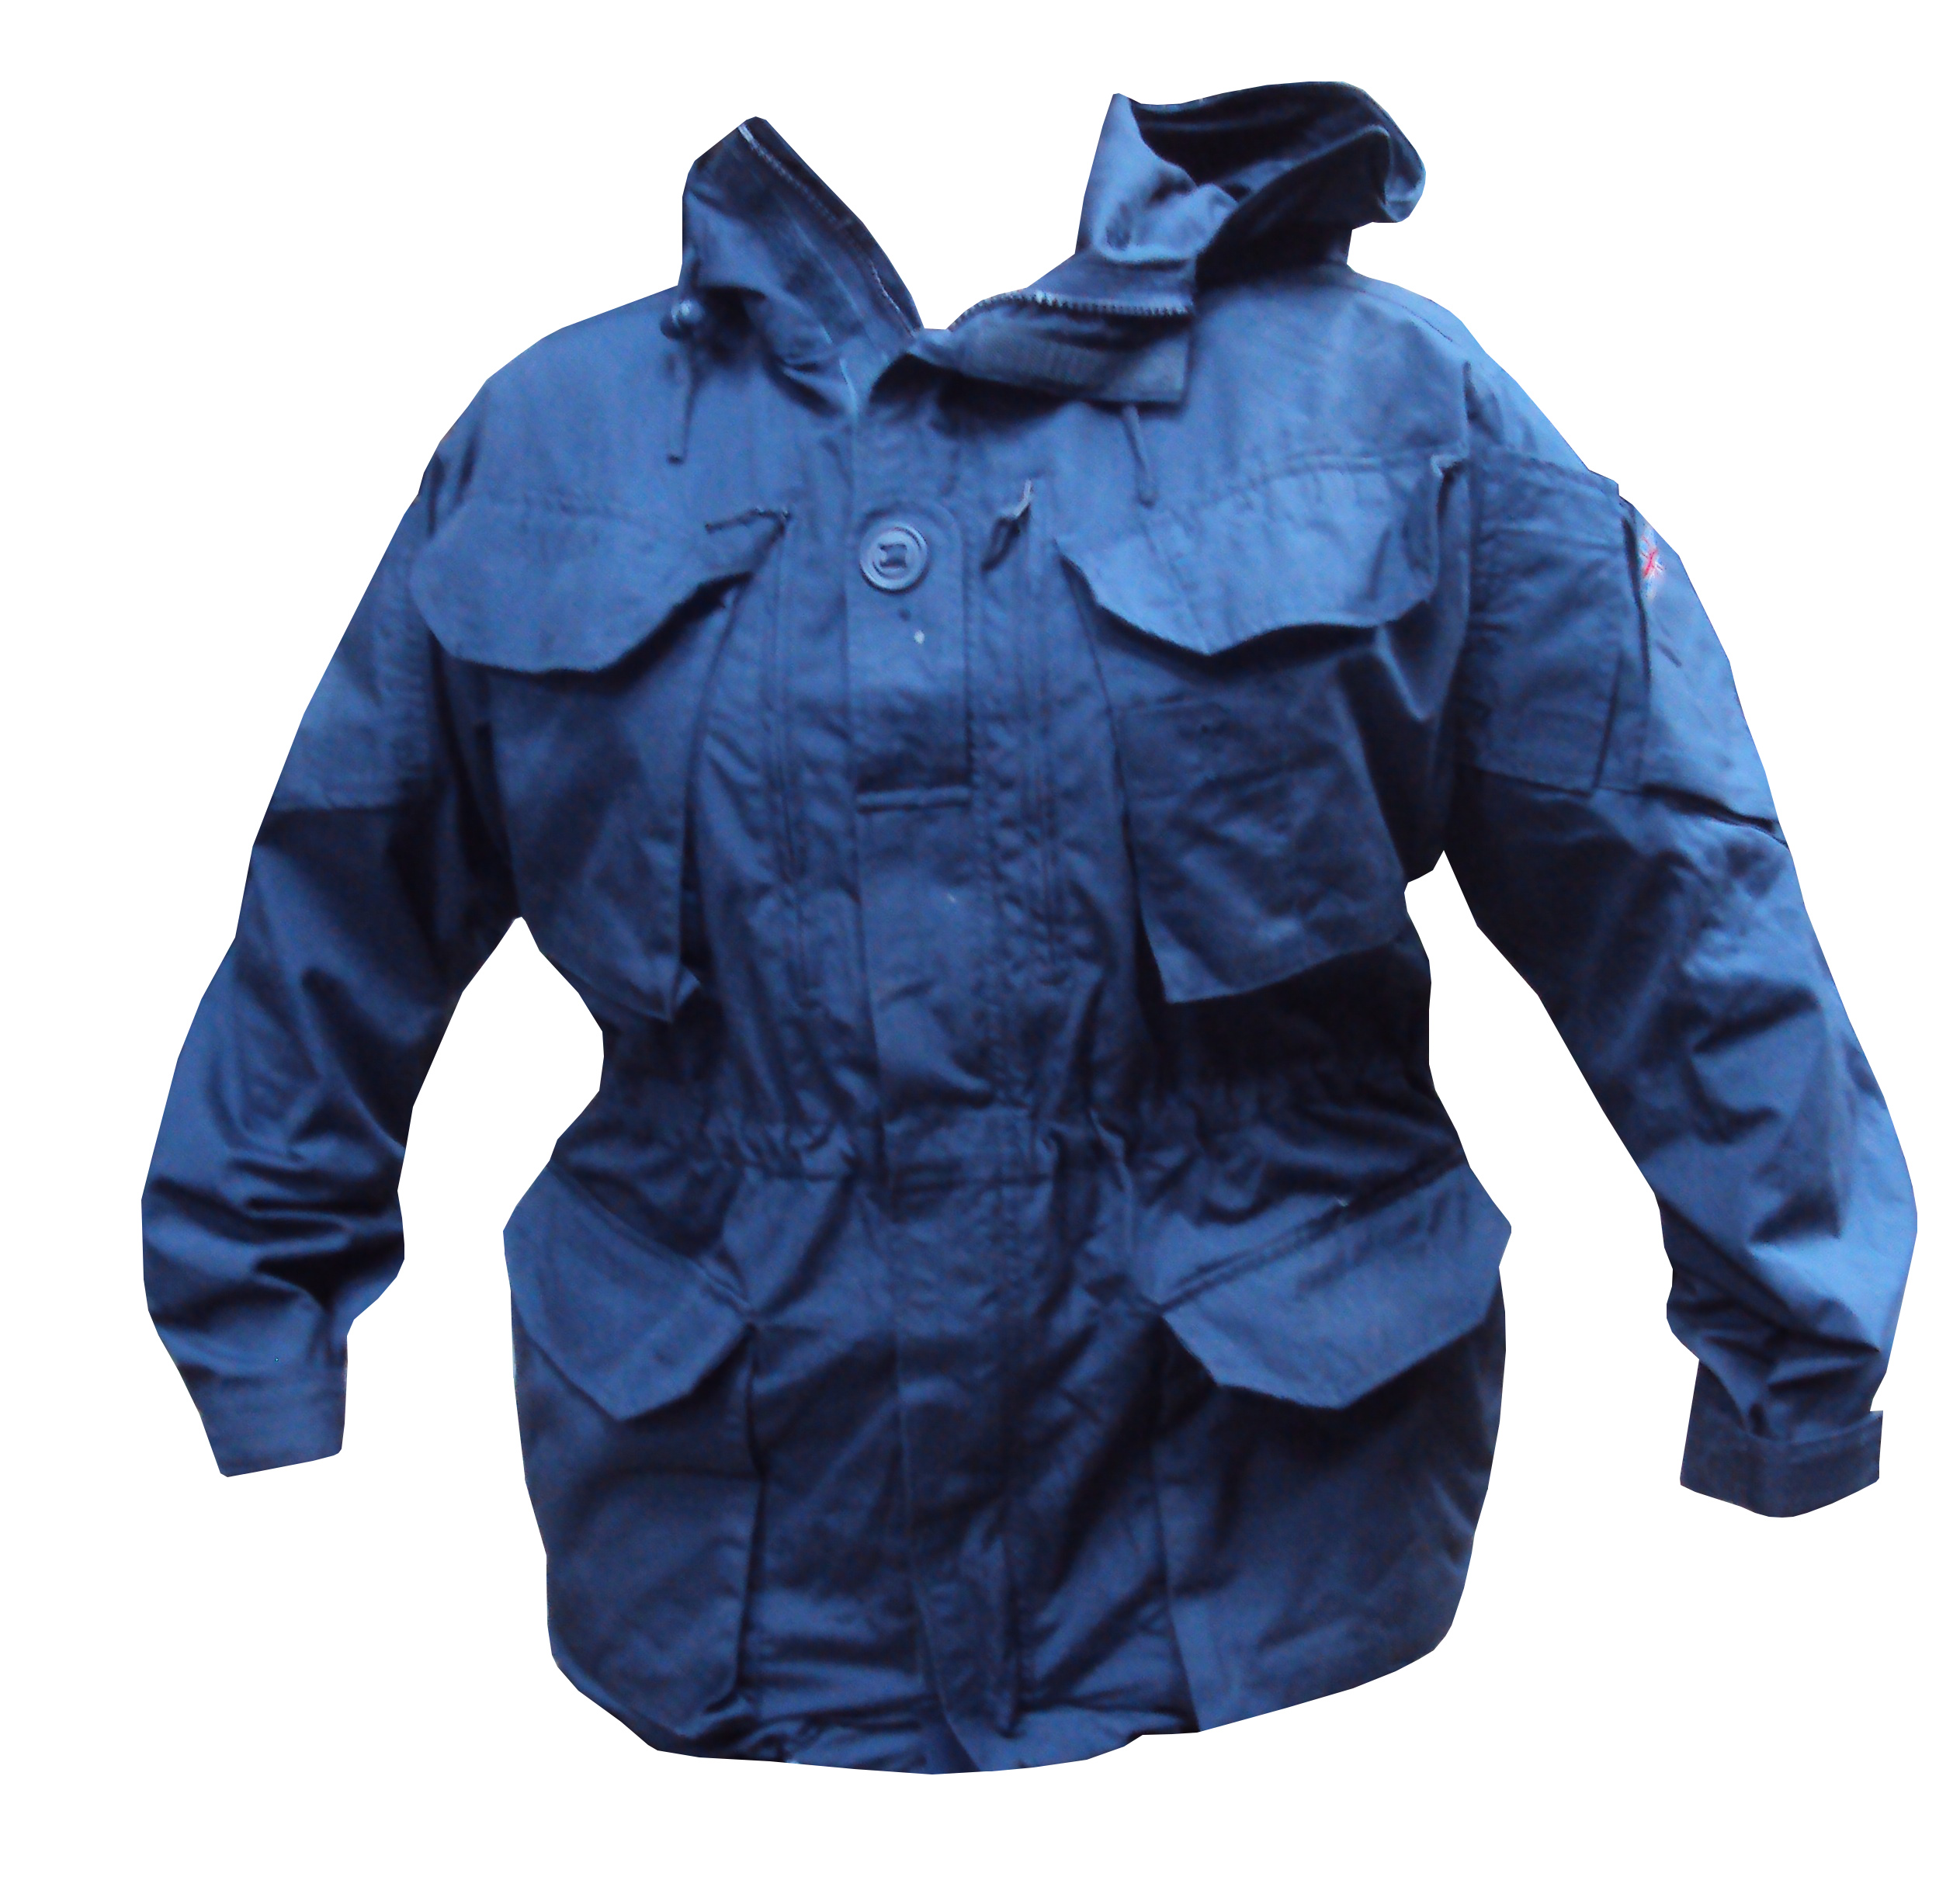 Lot 4 - Pack of 5 - Blue Windproof Smock - Large - Grade 1